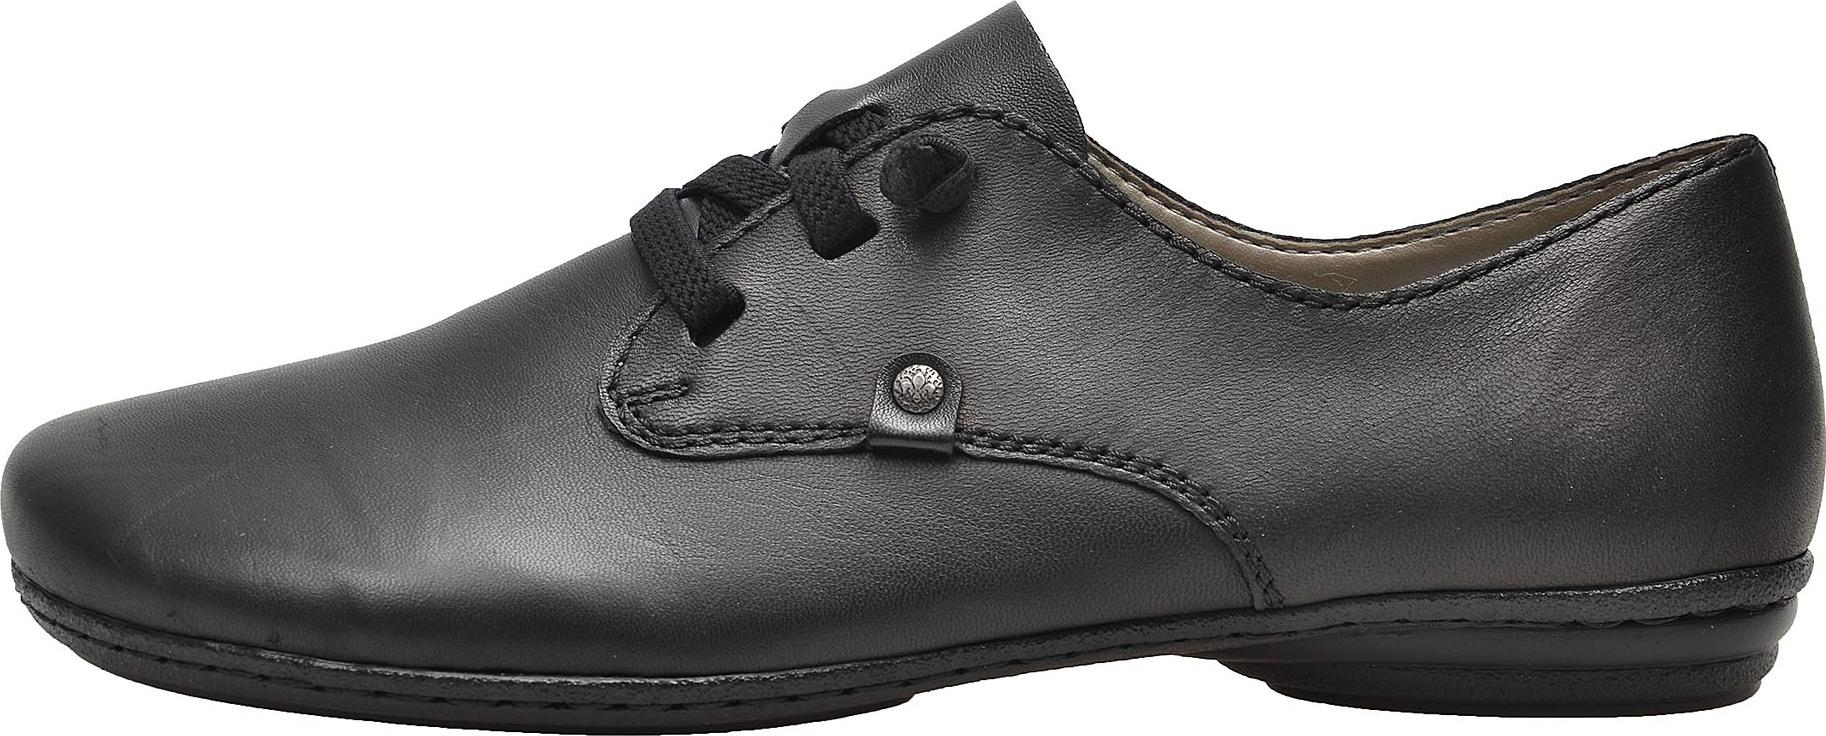 cc2989a9d88 Dámská obuv RIEKER 53944 01 SCHWARZ F S 8 – Rieker Antistress